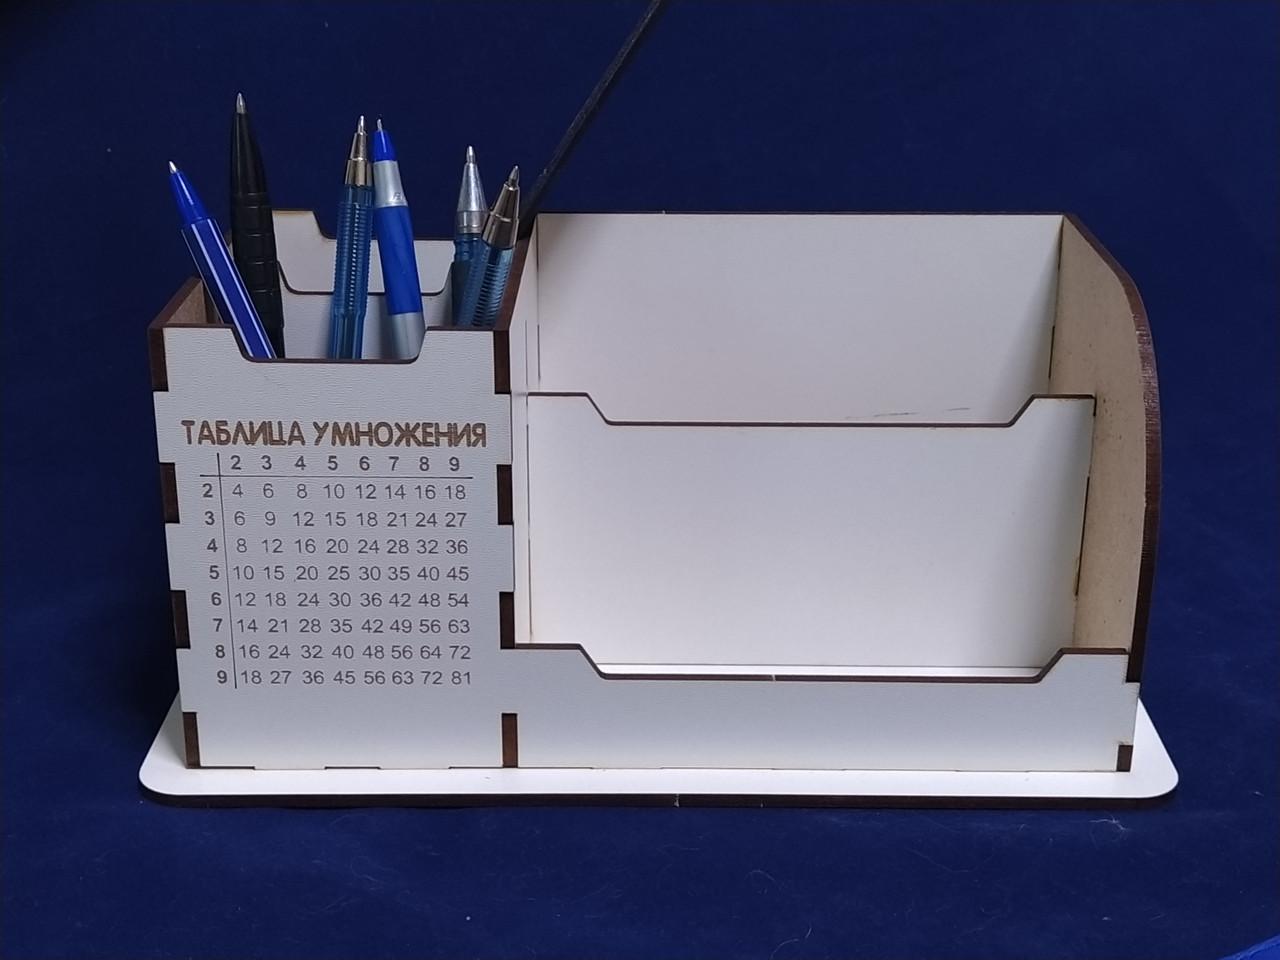 Заготовка подставка под ручки Д 206